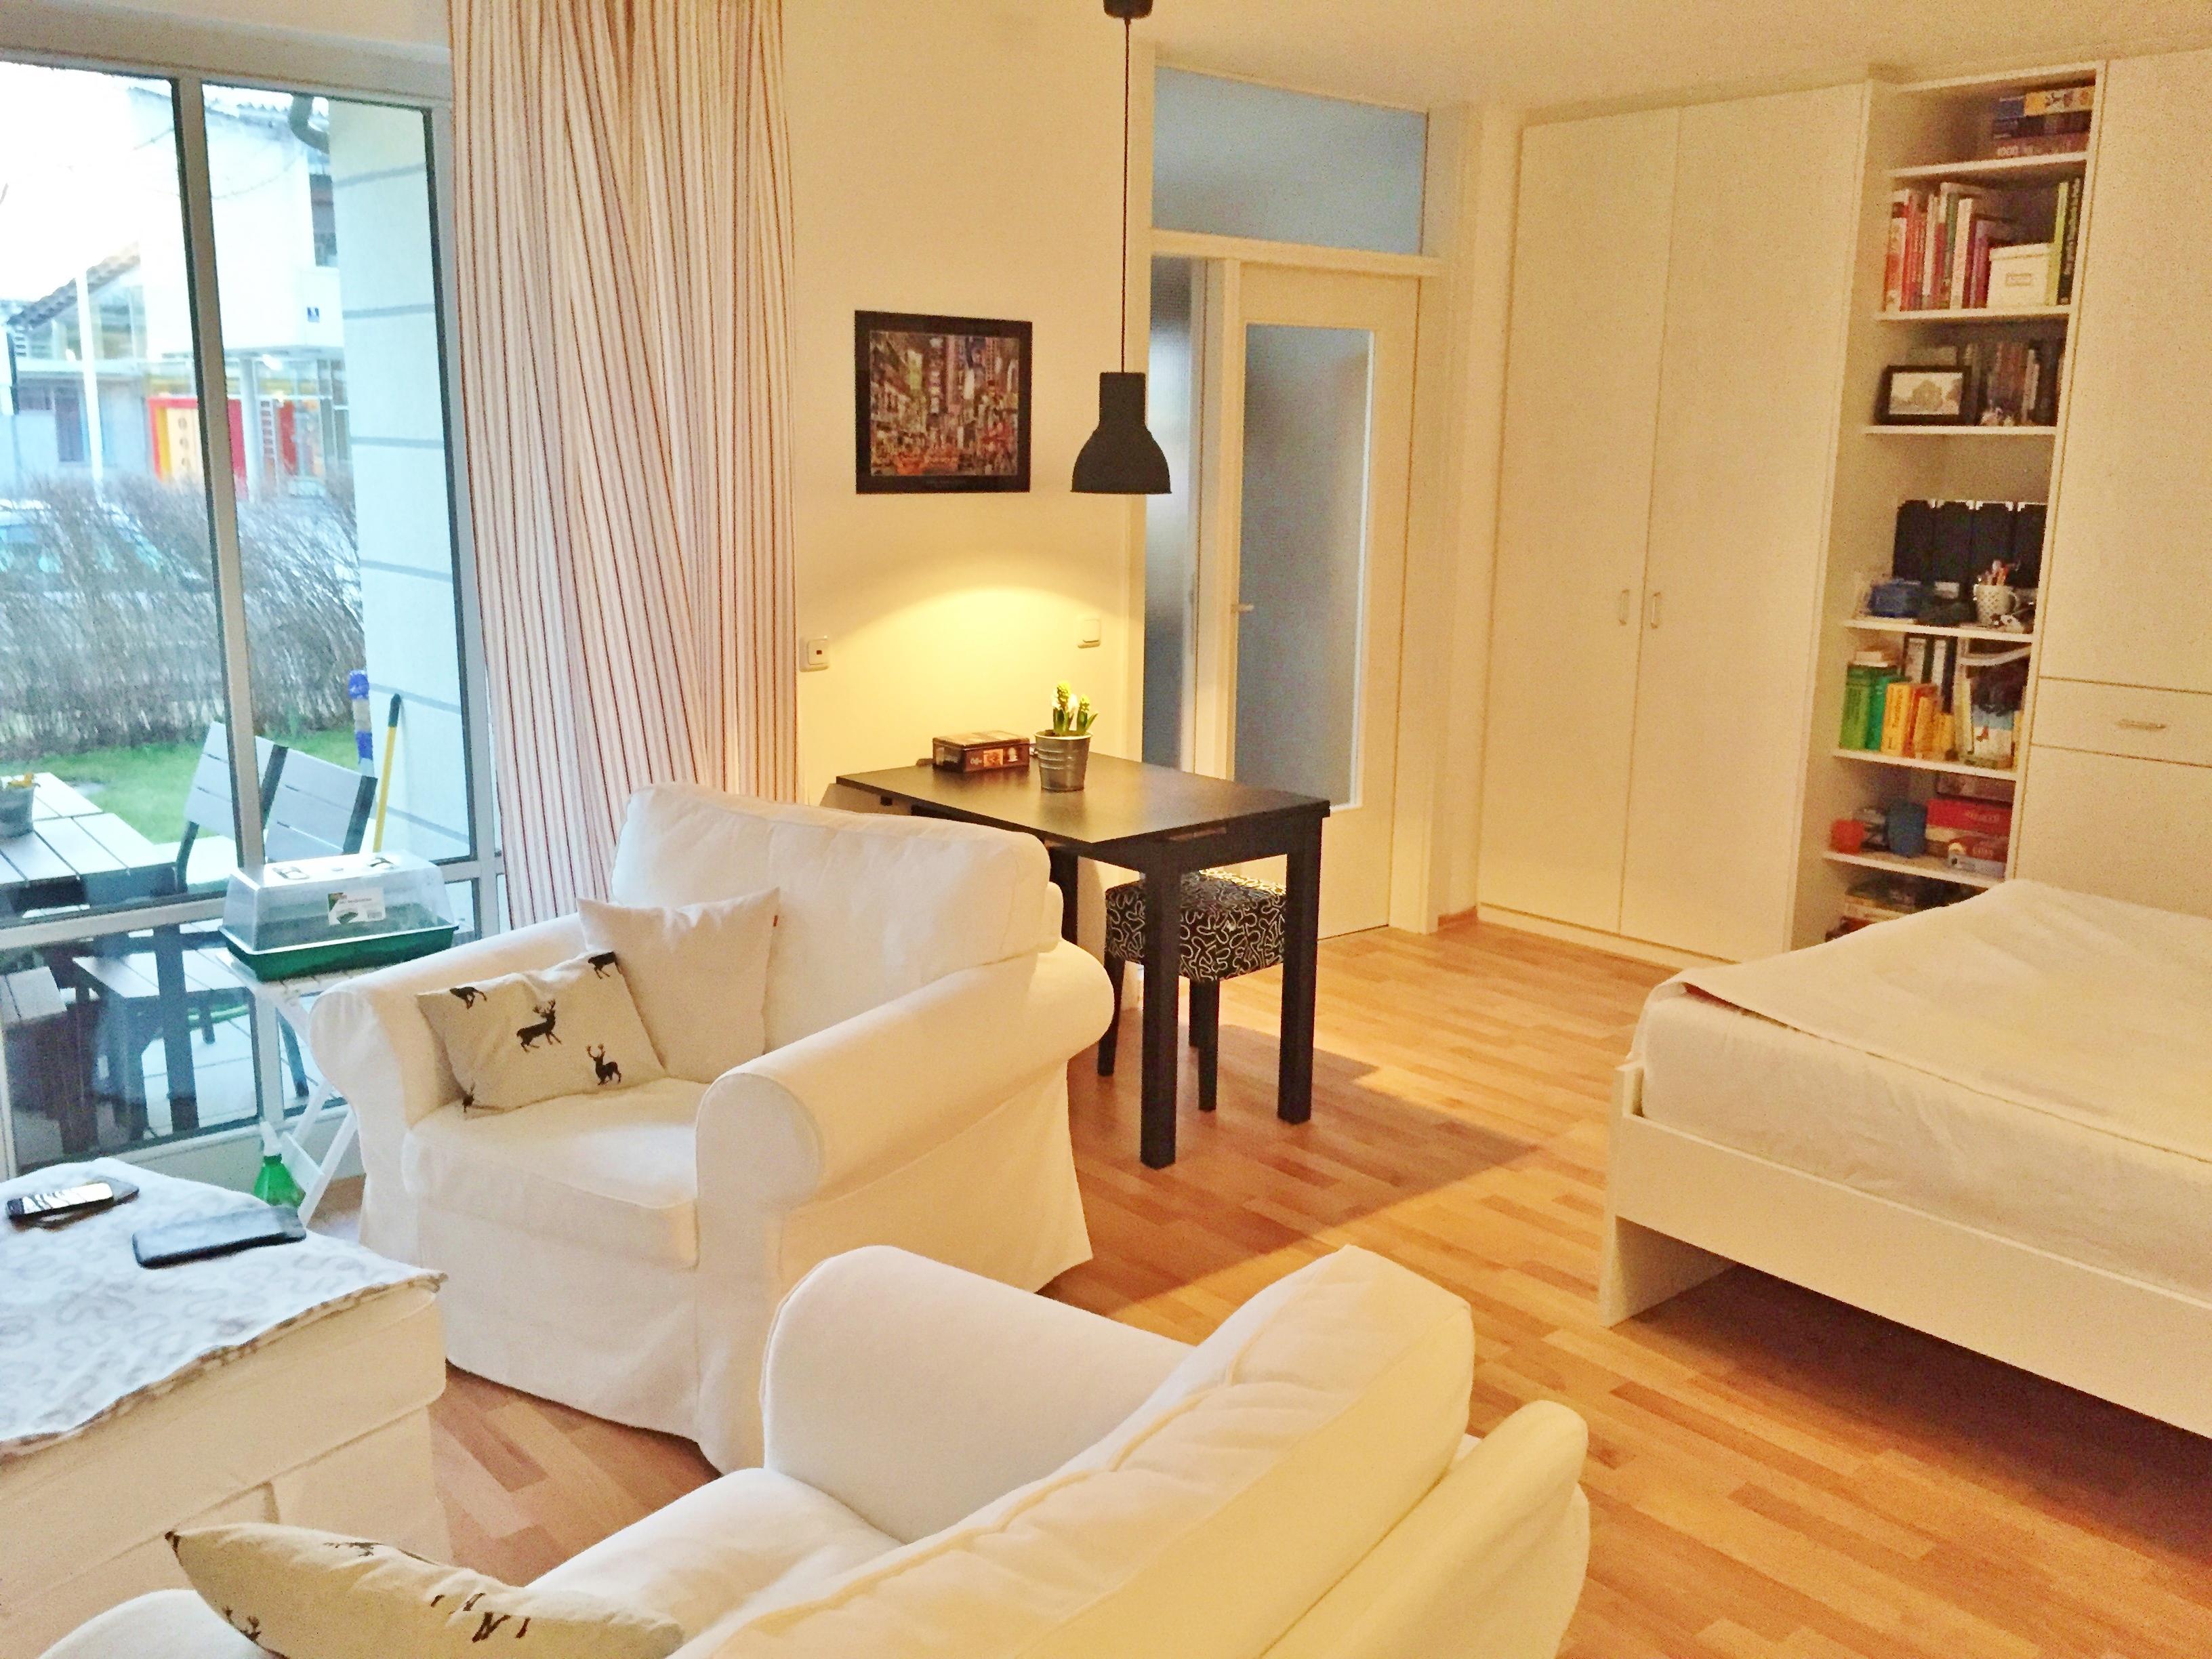 1 zimmer eigentumswohnung obermenzing m nchen banas immobilien. Black Bedroom Furniture Sets. Home Design Ideas